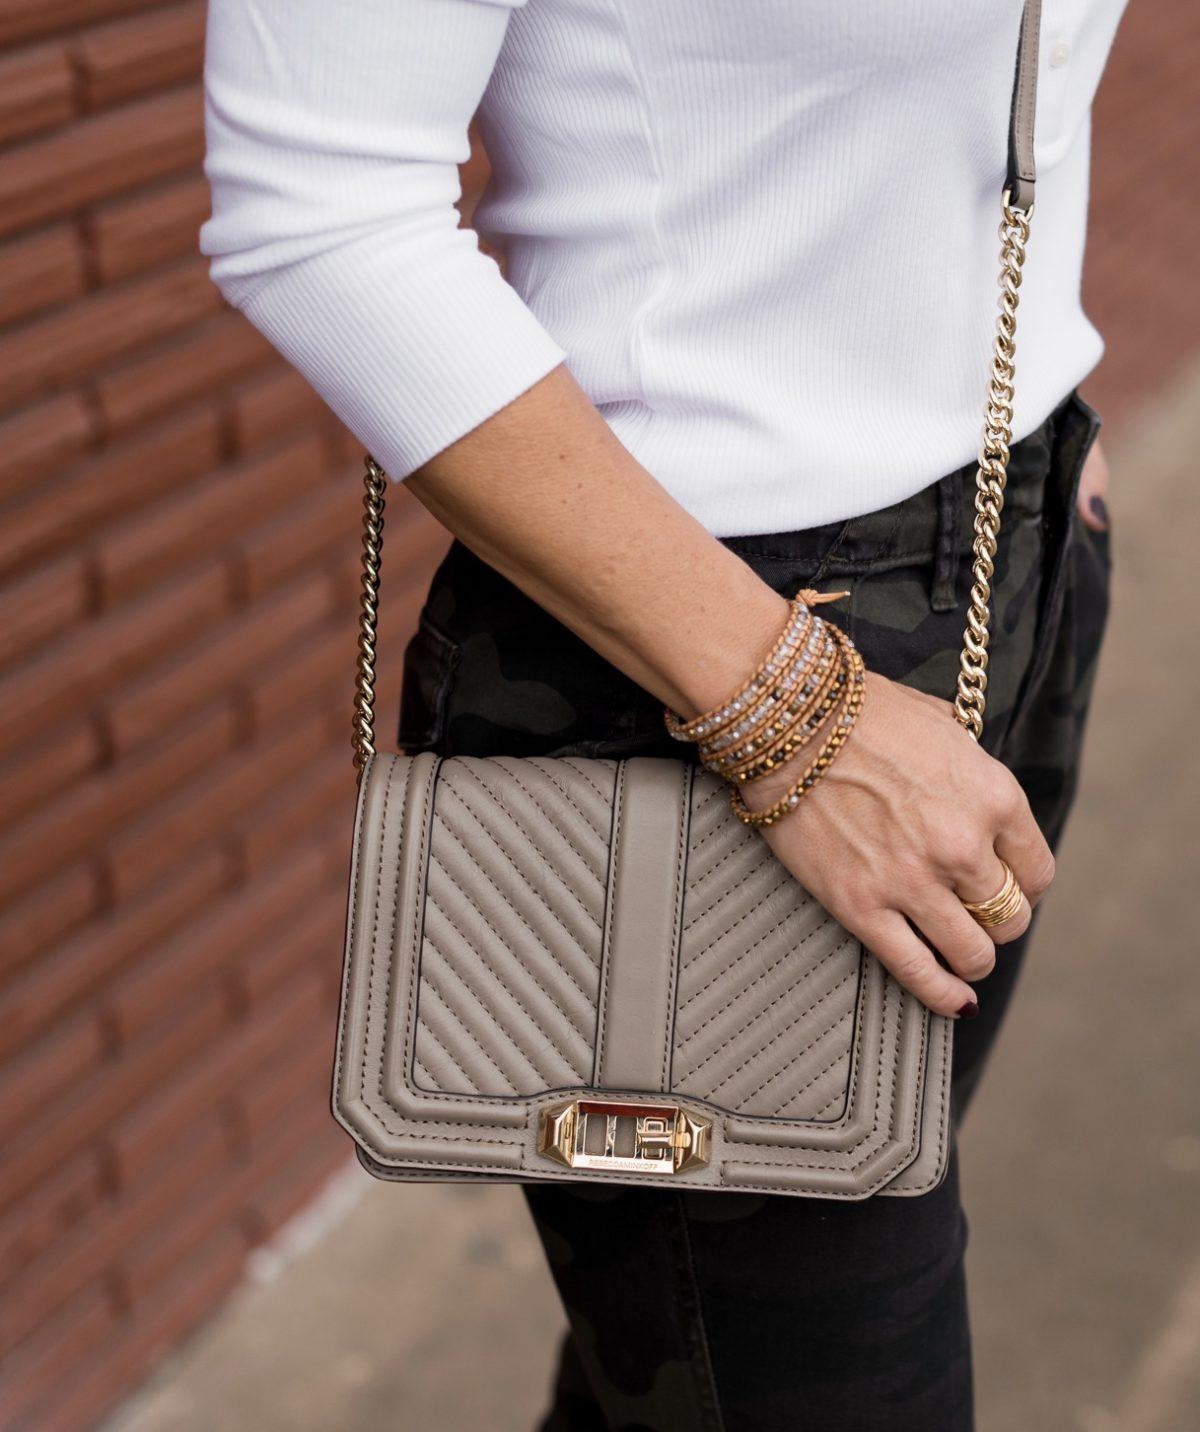 Victoria Emerson Wrap Bracelets Buy 1 Get 1 FREE